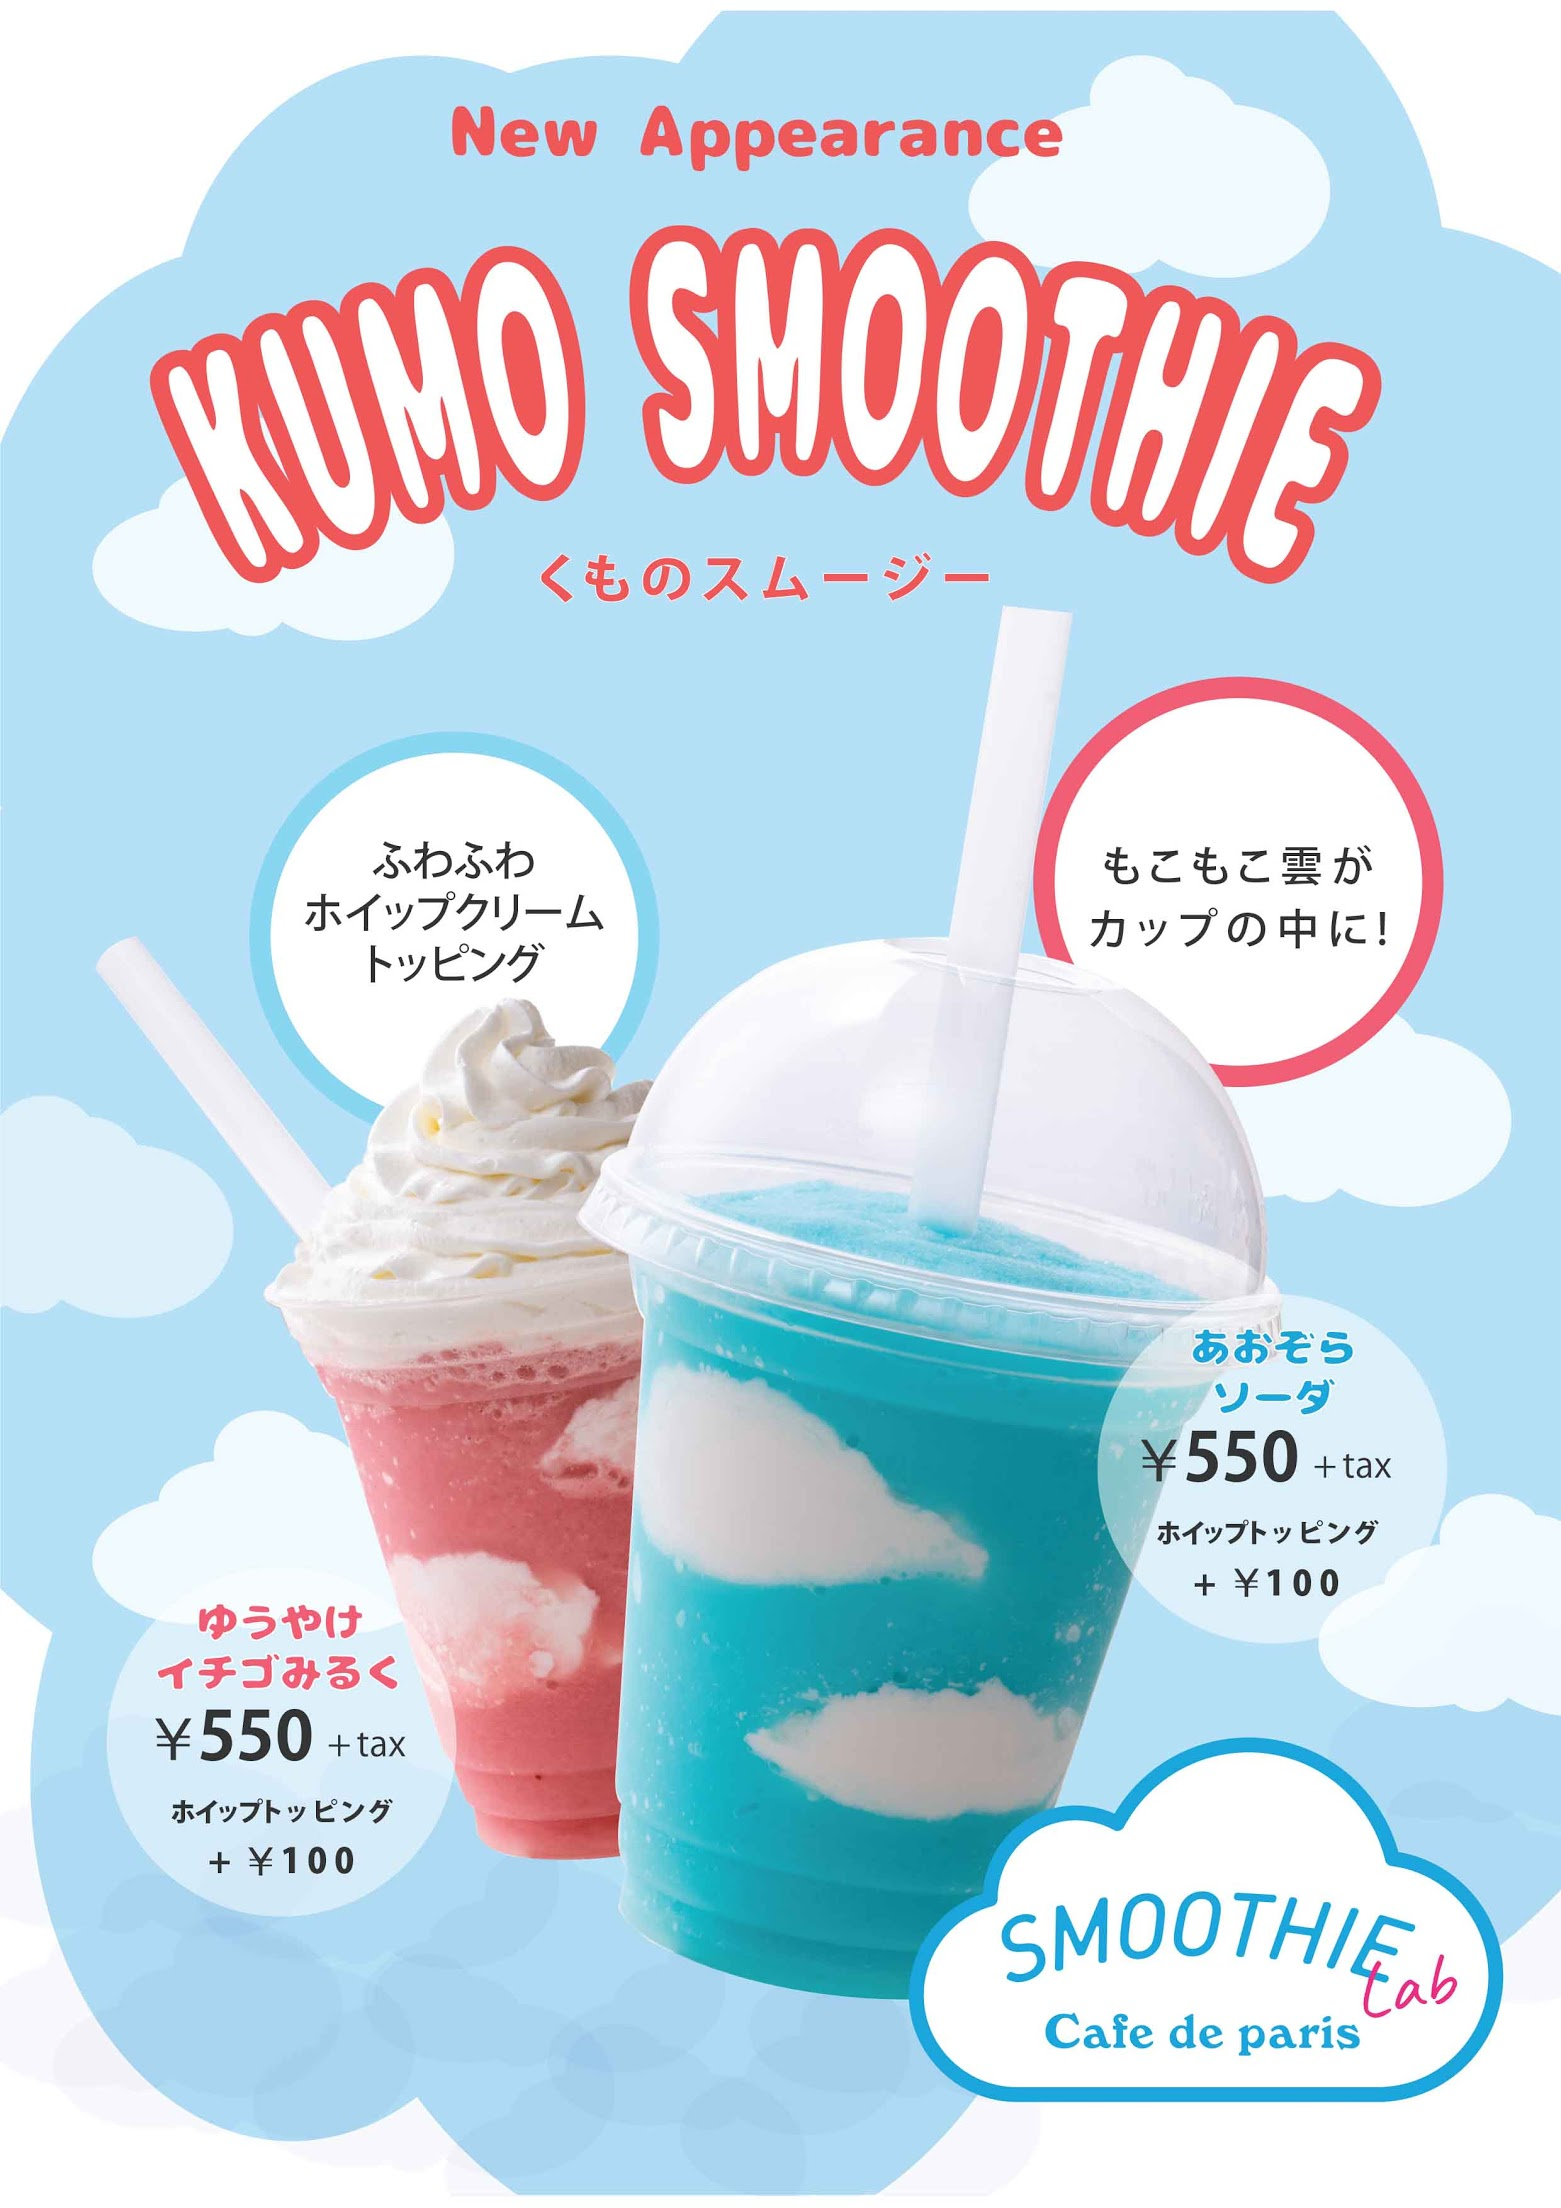 kumo-smoothie-%e9%9b%b2%e3%81%ae%e3%82%b9%e3%83%a0%e3%83%bc%e3%82%b8%e3%83%bc-2